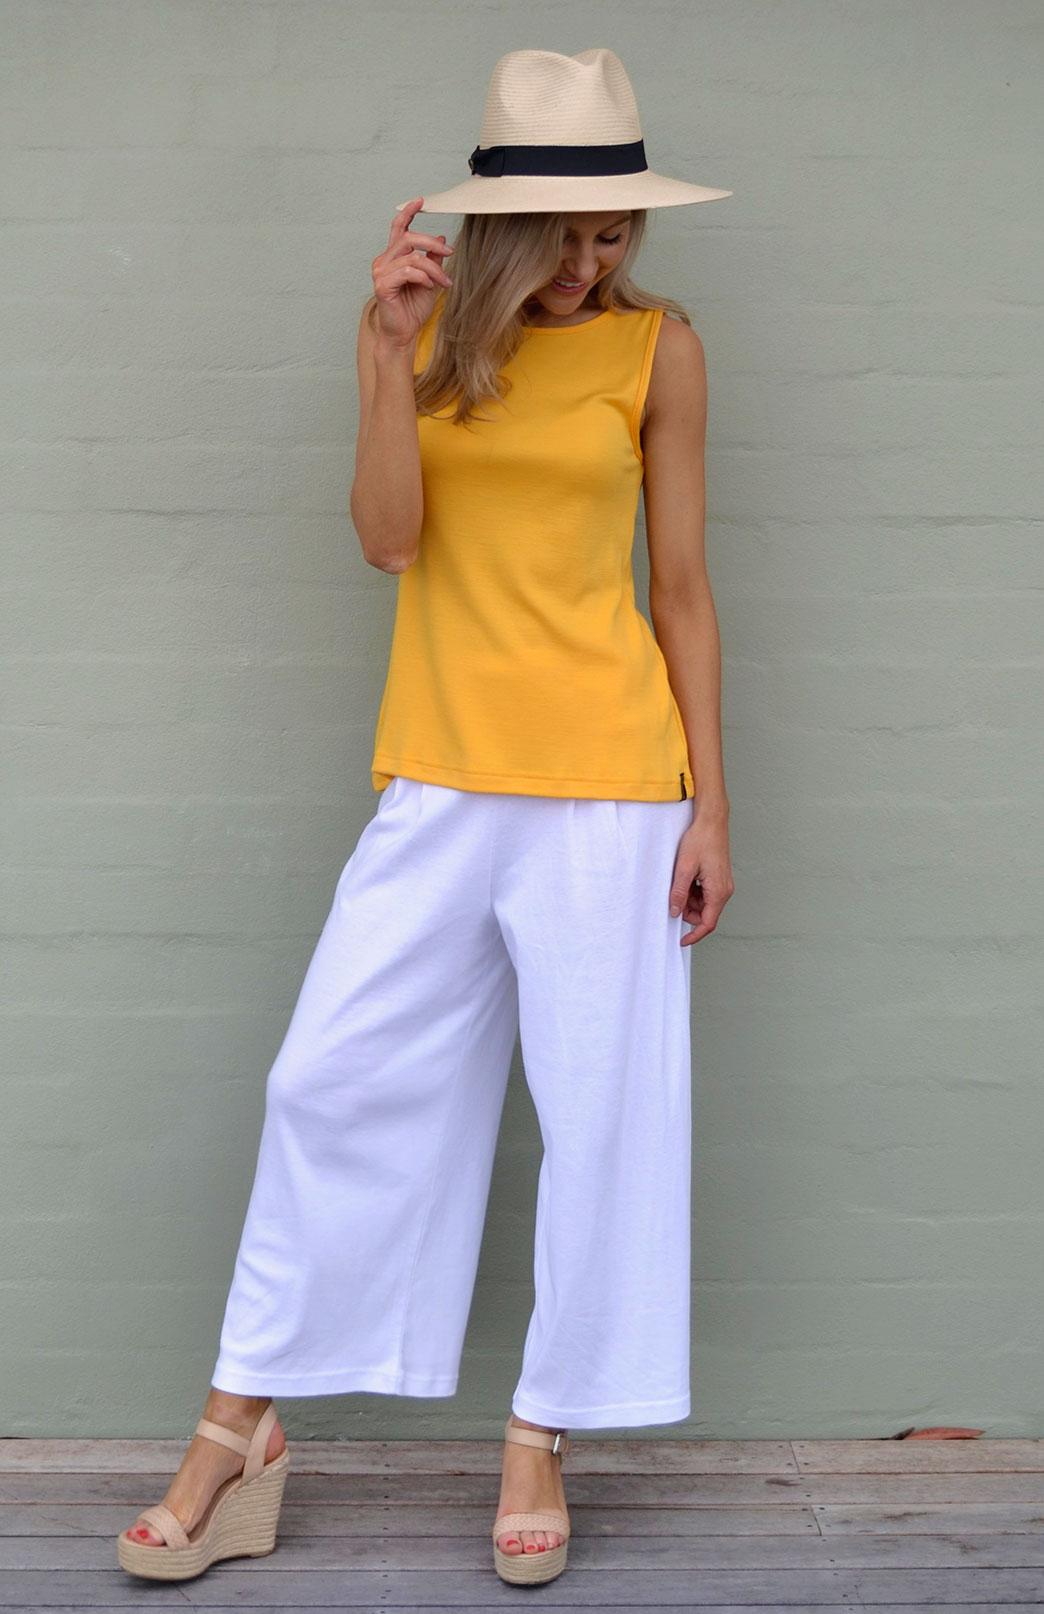 Wide Leg Crop Pant - COTTON - Women's Merino Cotton Crop Pants with Wide Legs and Waistband - Smitten Merino Tasmania Australia